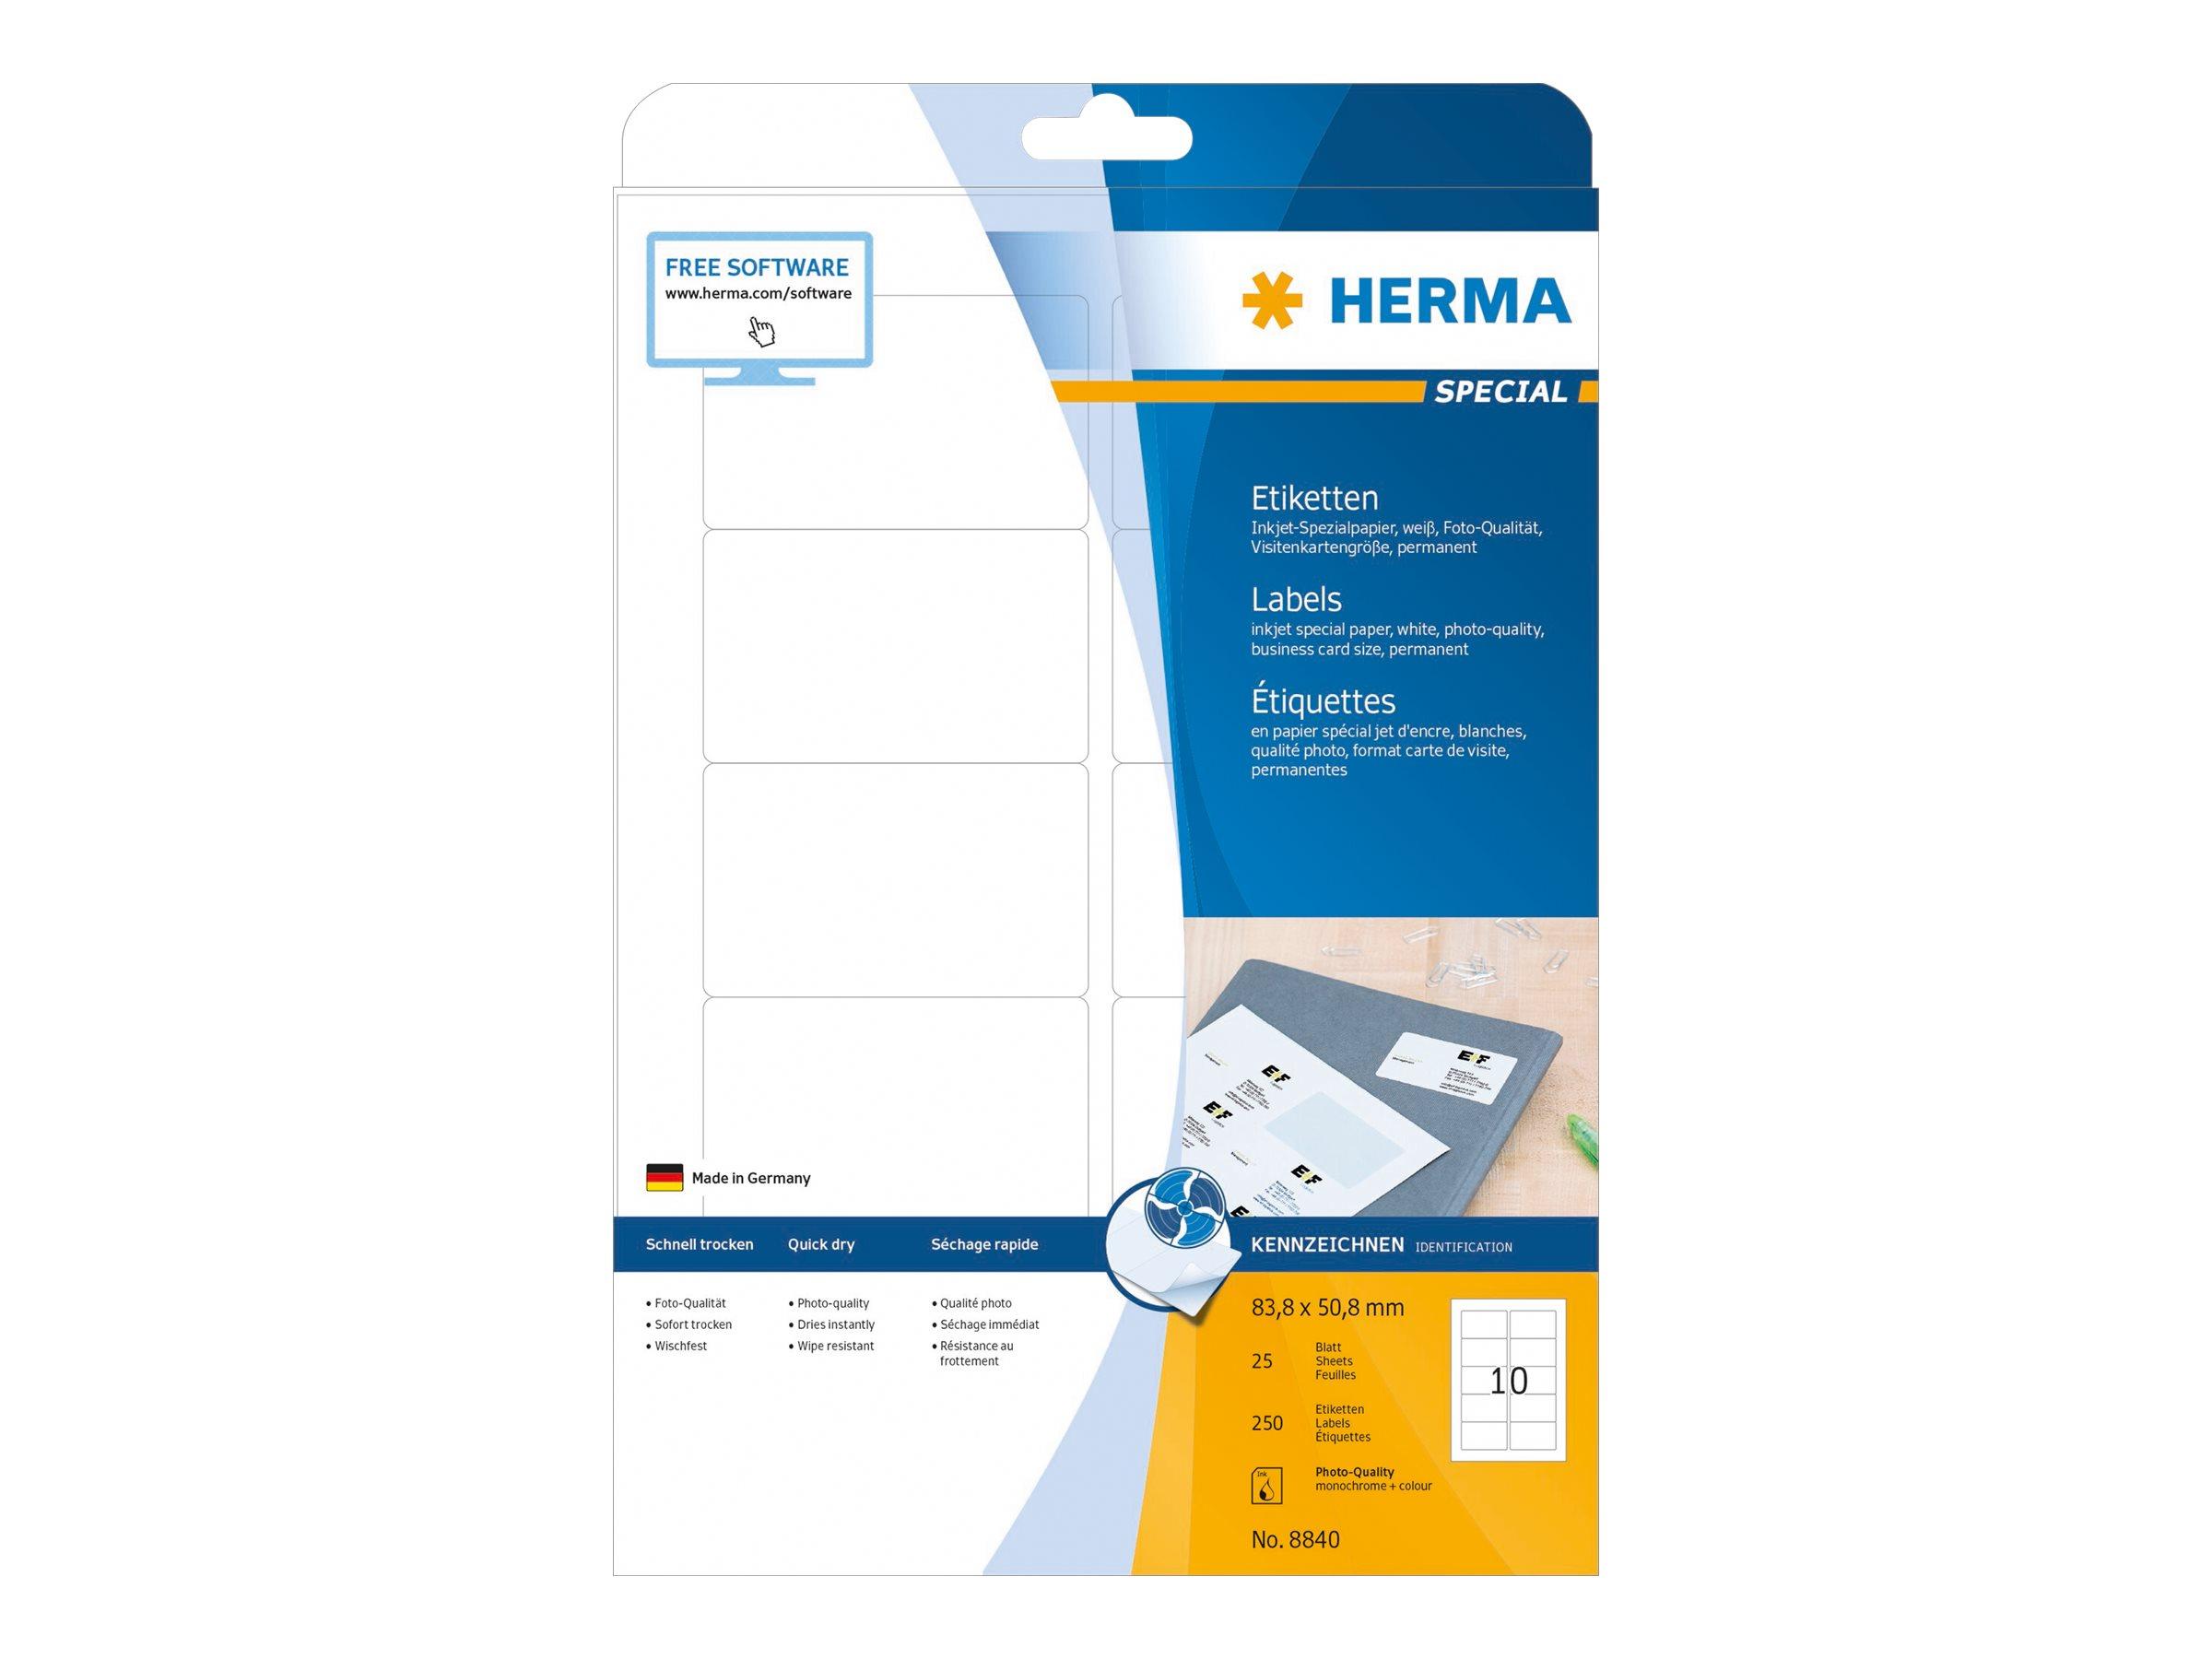 HERMA Special - Papier - matt - permanent selbstklebend - beschichtet - weiß - 83.8 x 50.8 mm - 90 g/m² - 250 Etikett(en) (25 Bogen x 10)